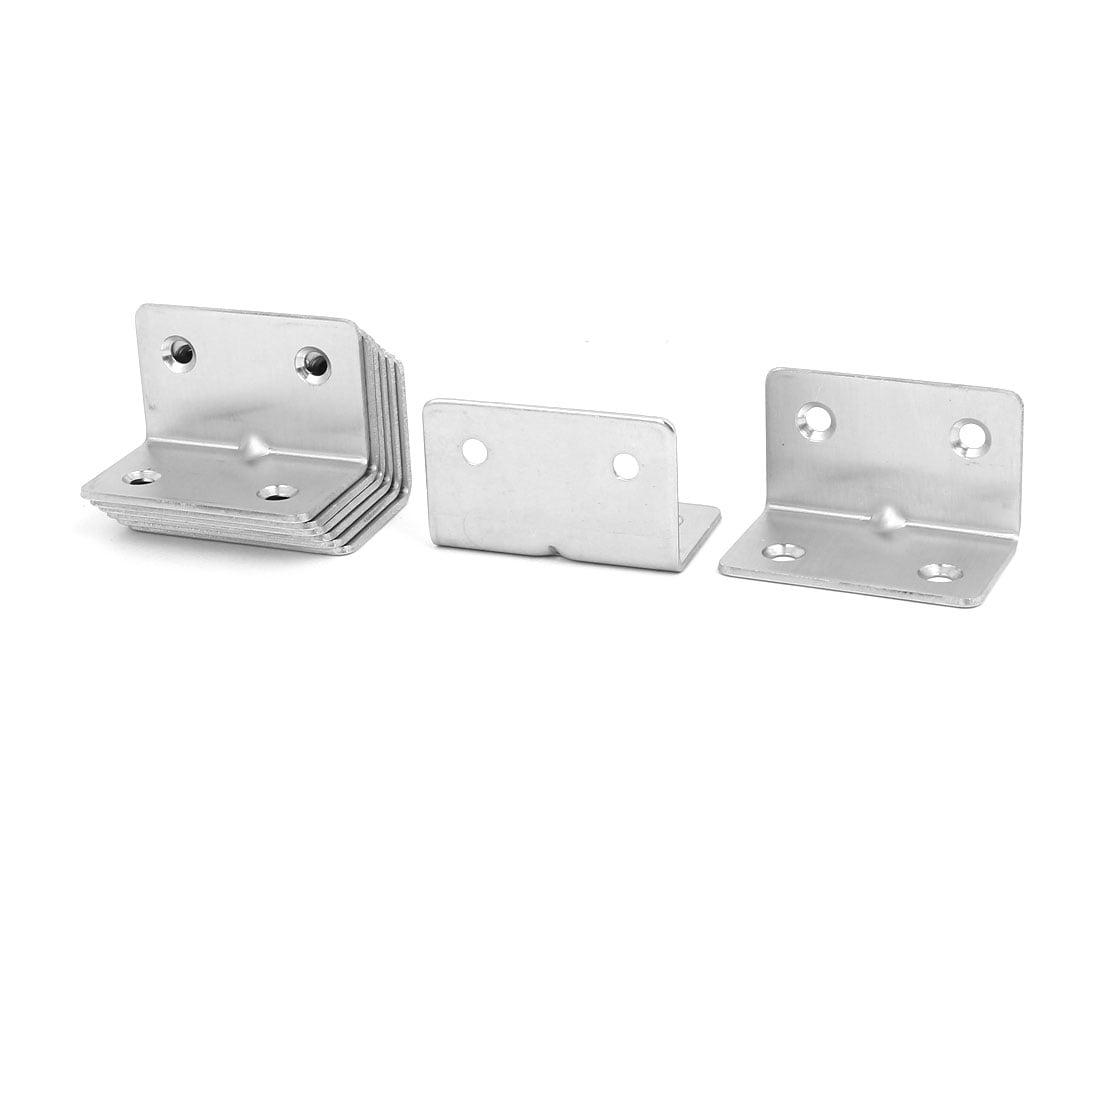 Unique Bargains31mmx31mmx50mm Stainless Steel Right Angle Bracket Corner Brace Fastener 8pcs